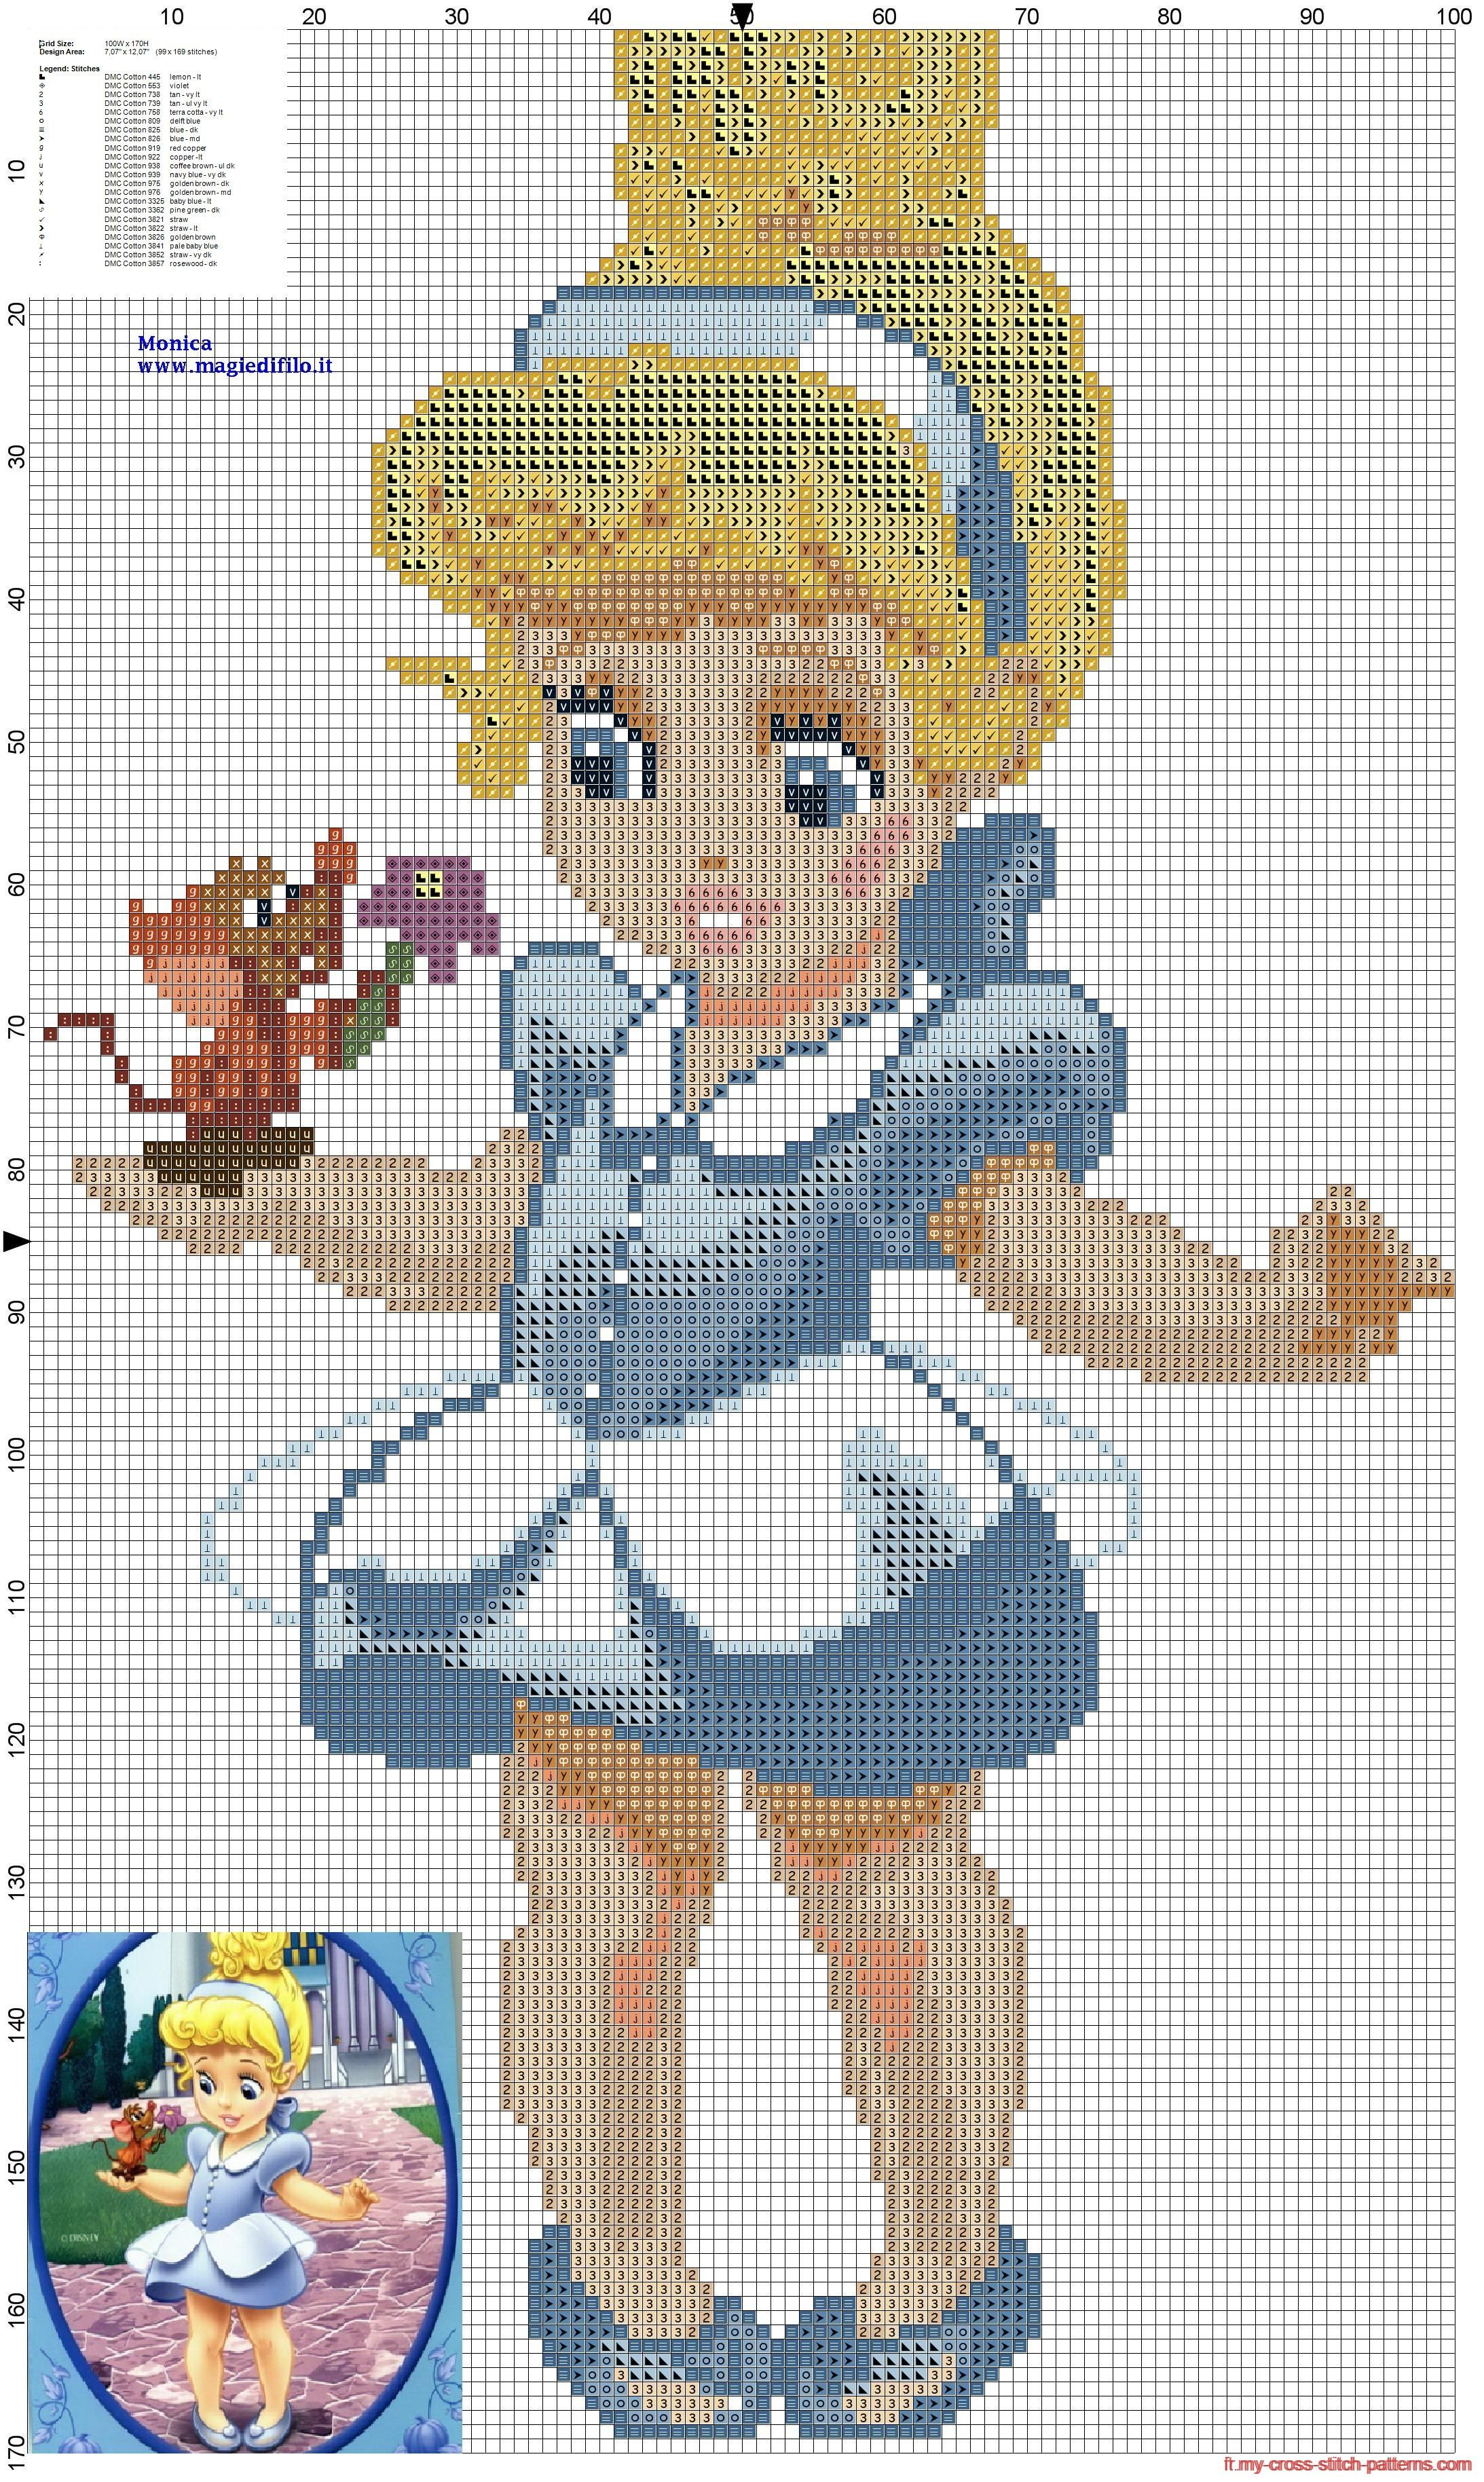 Petite princesse cendrillon grille point de croix - Petite princesse disney ...